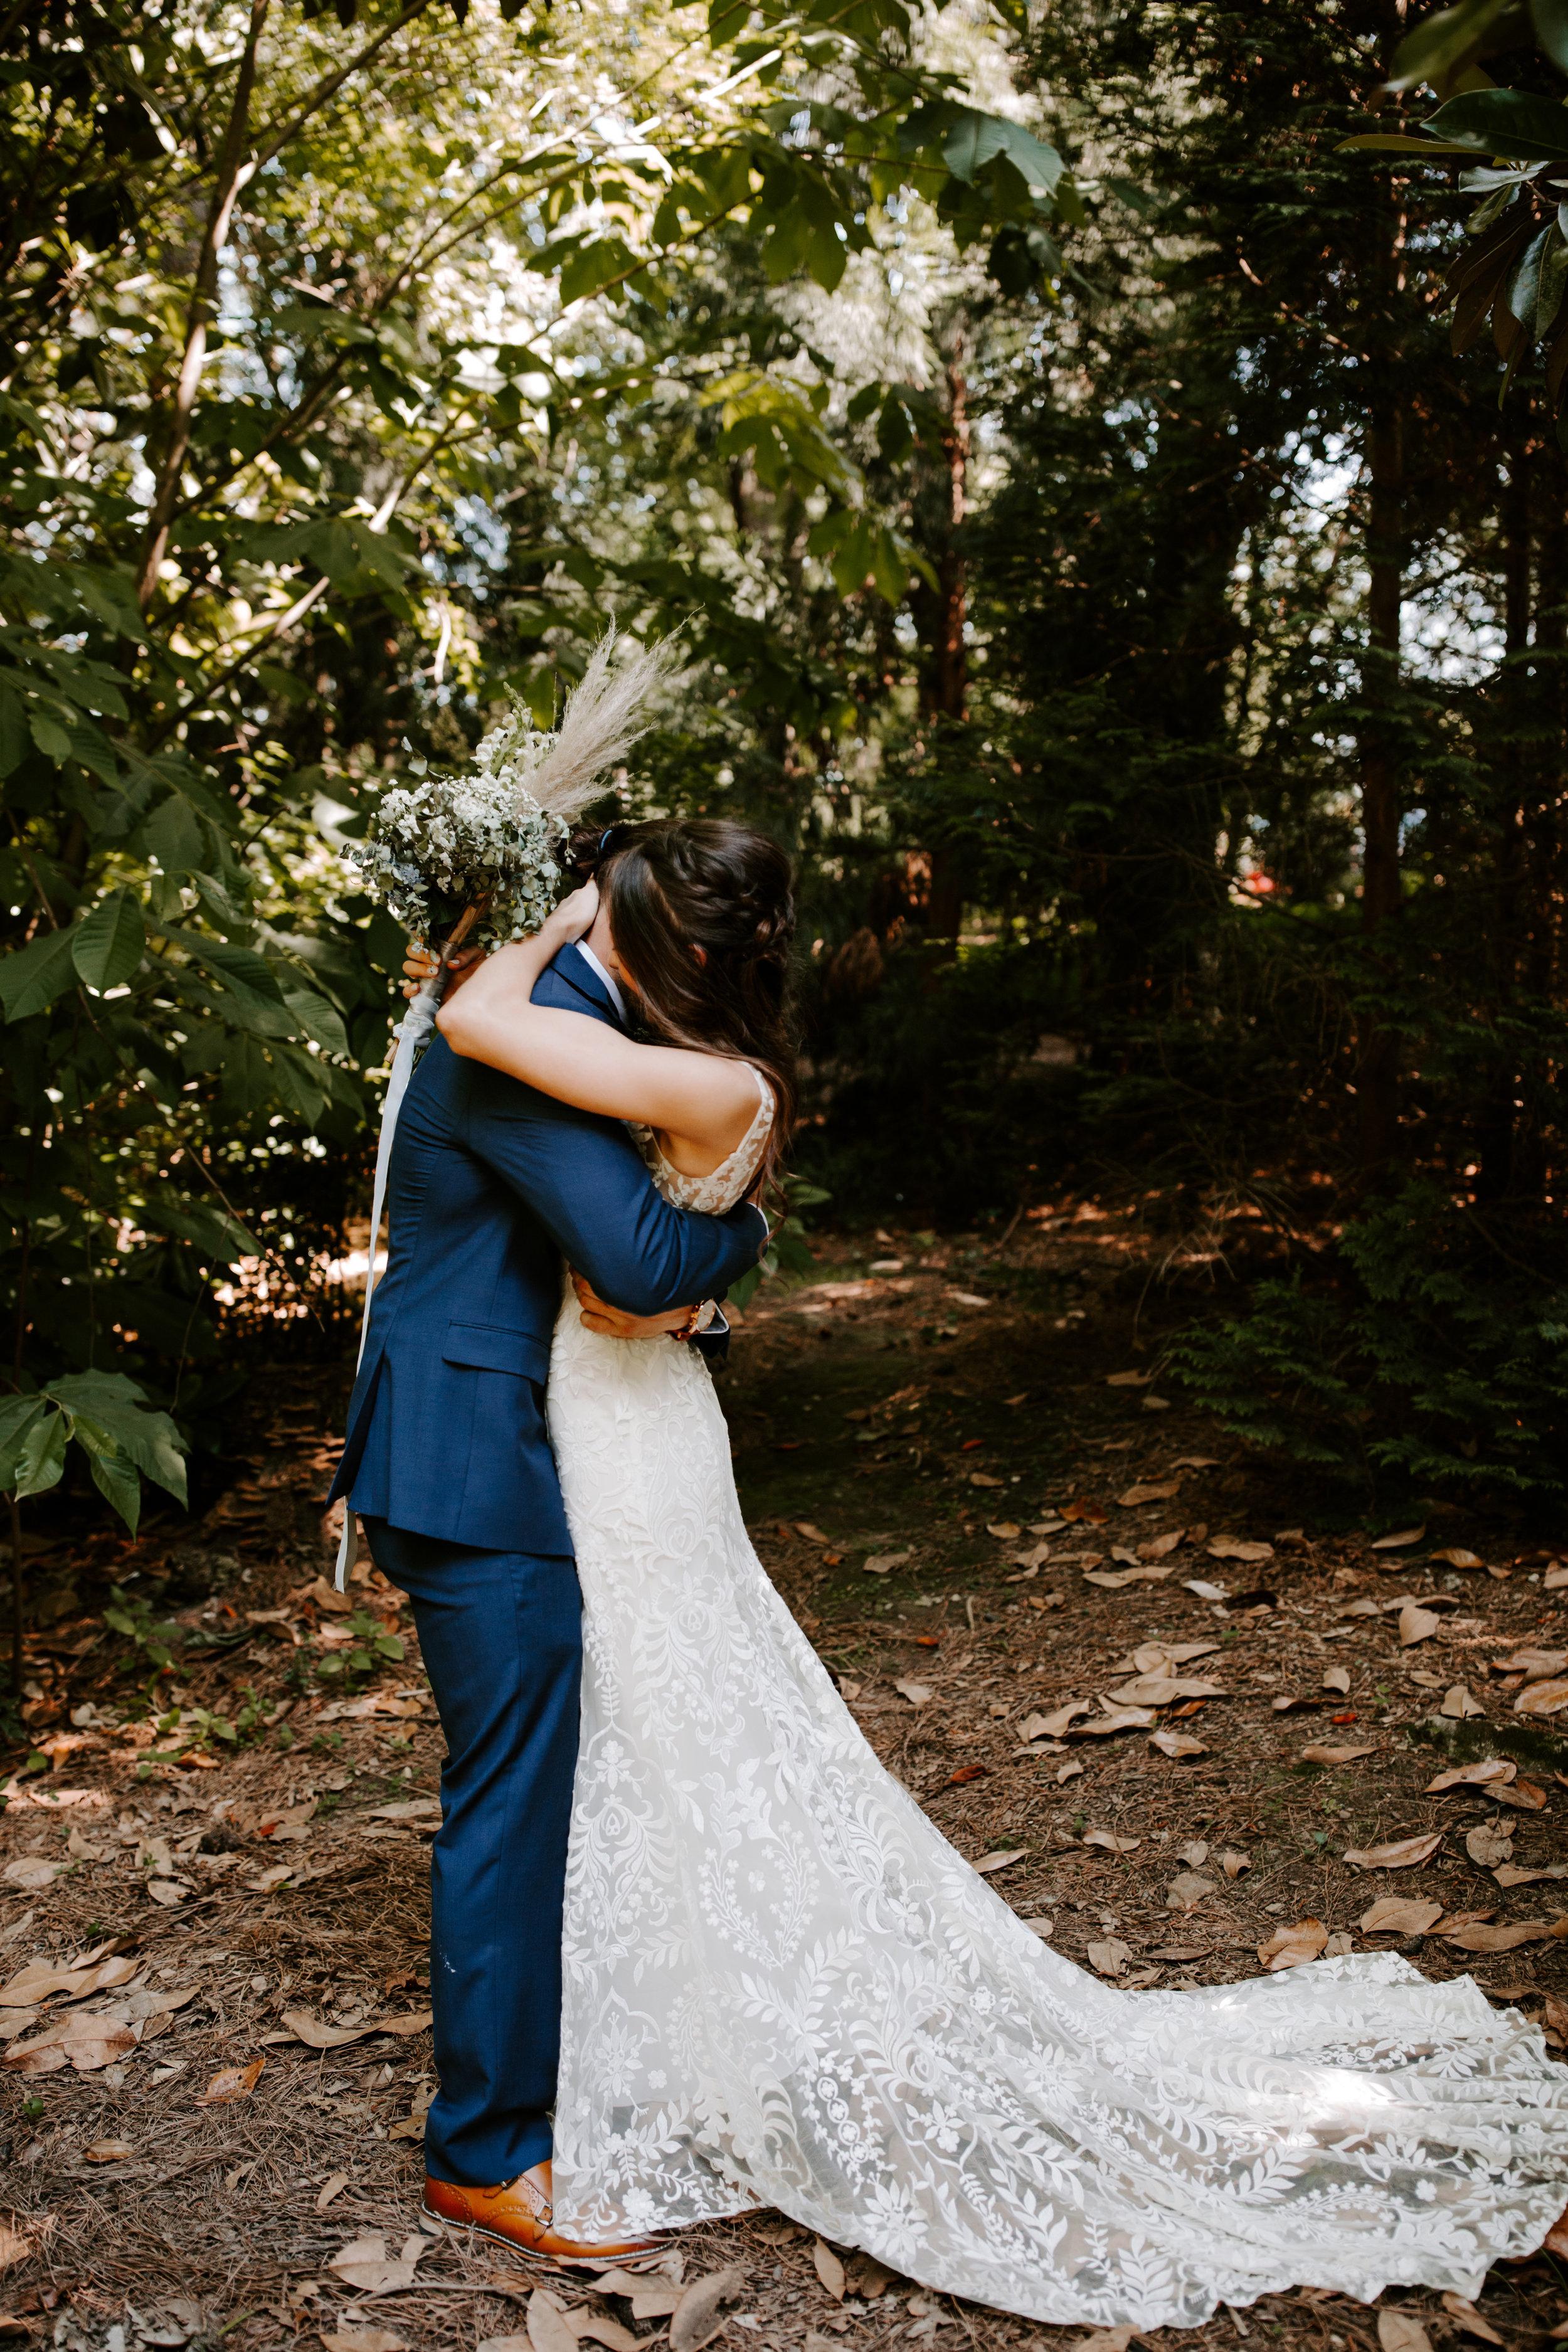 daywedding-168.jpg